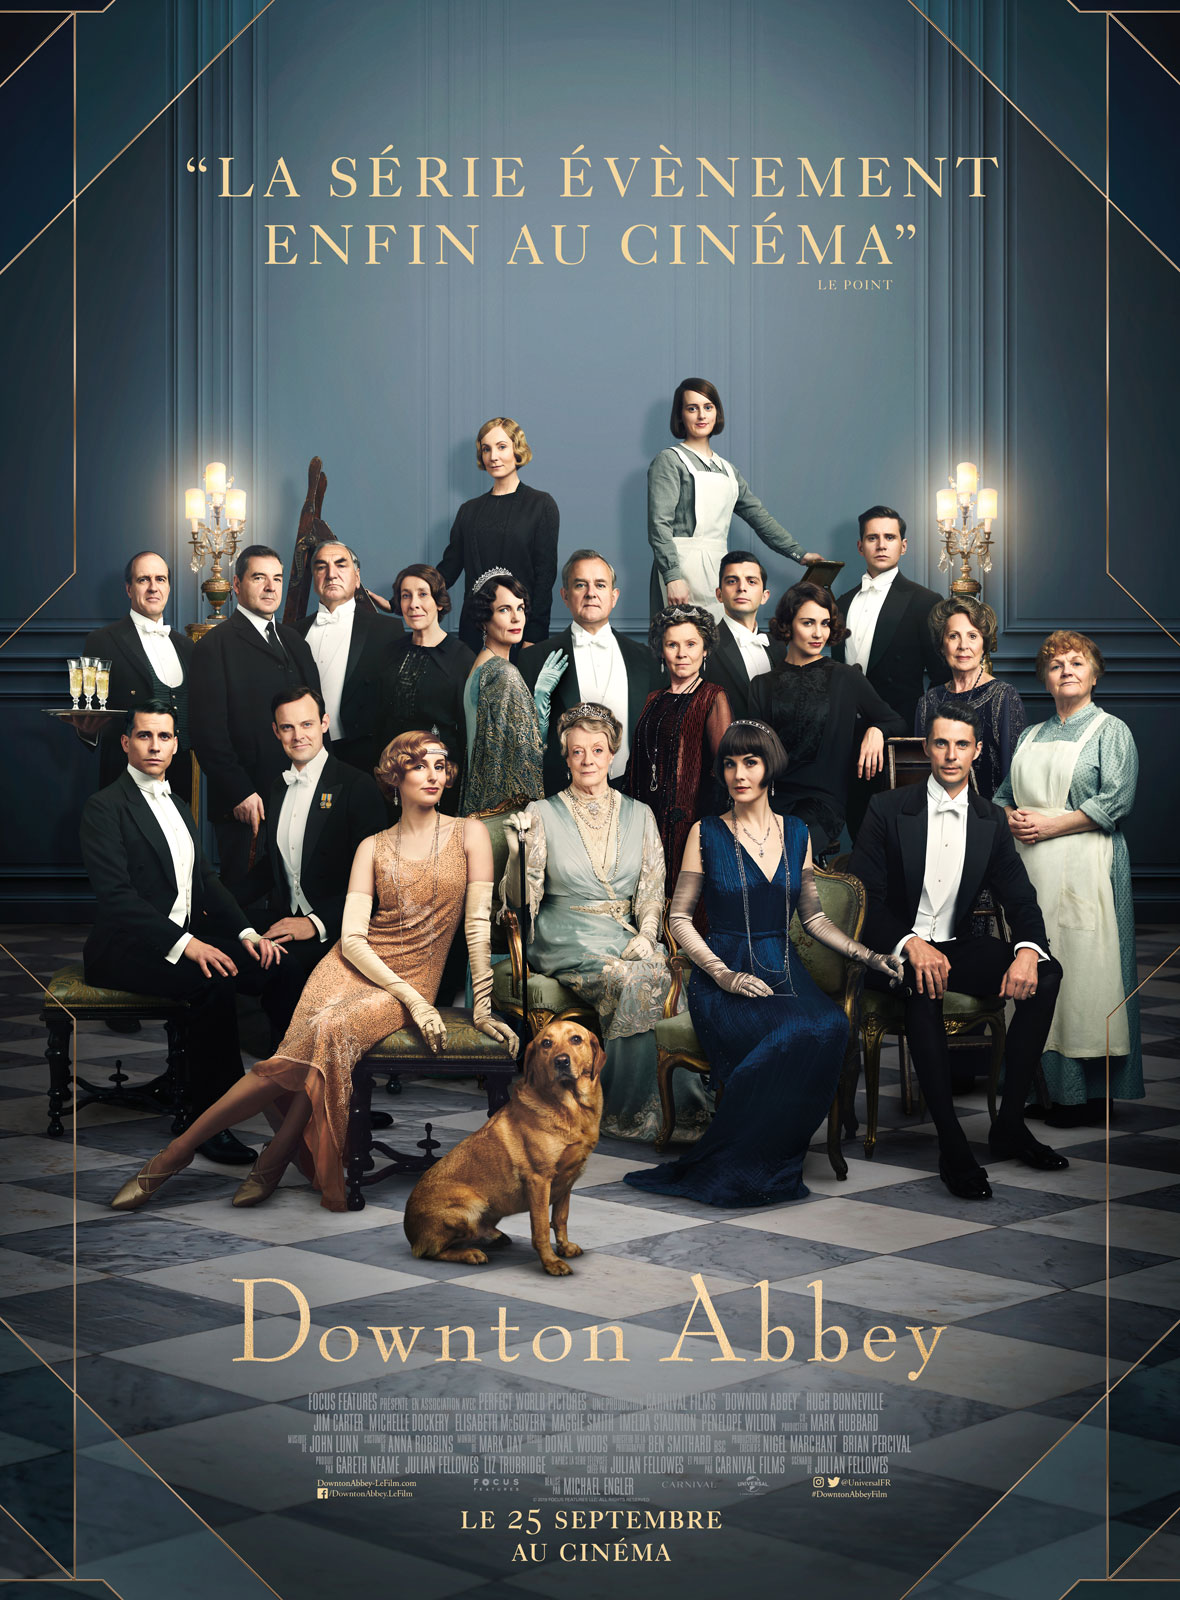 Achat Downton Abbey en DVD - AlloCiné